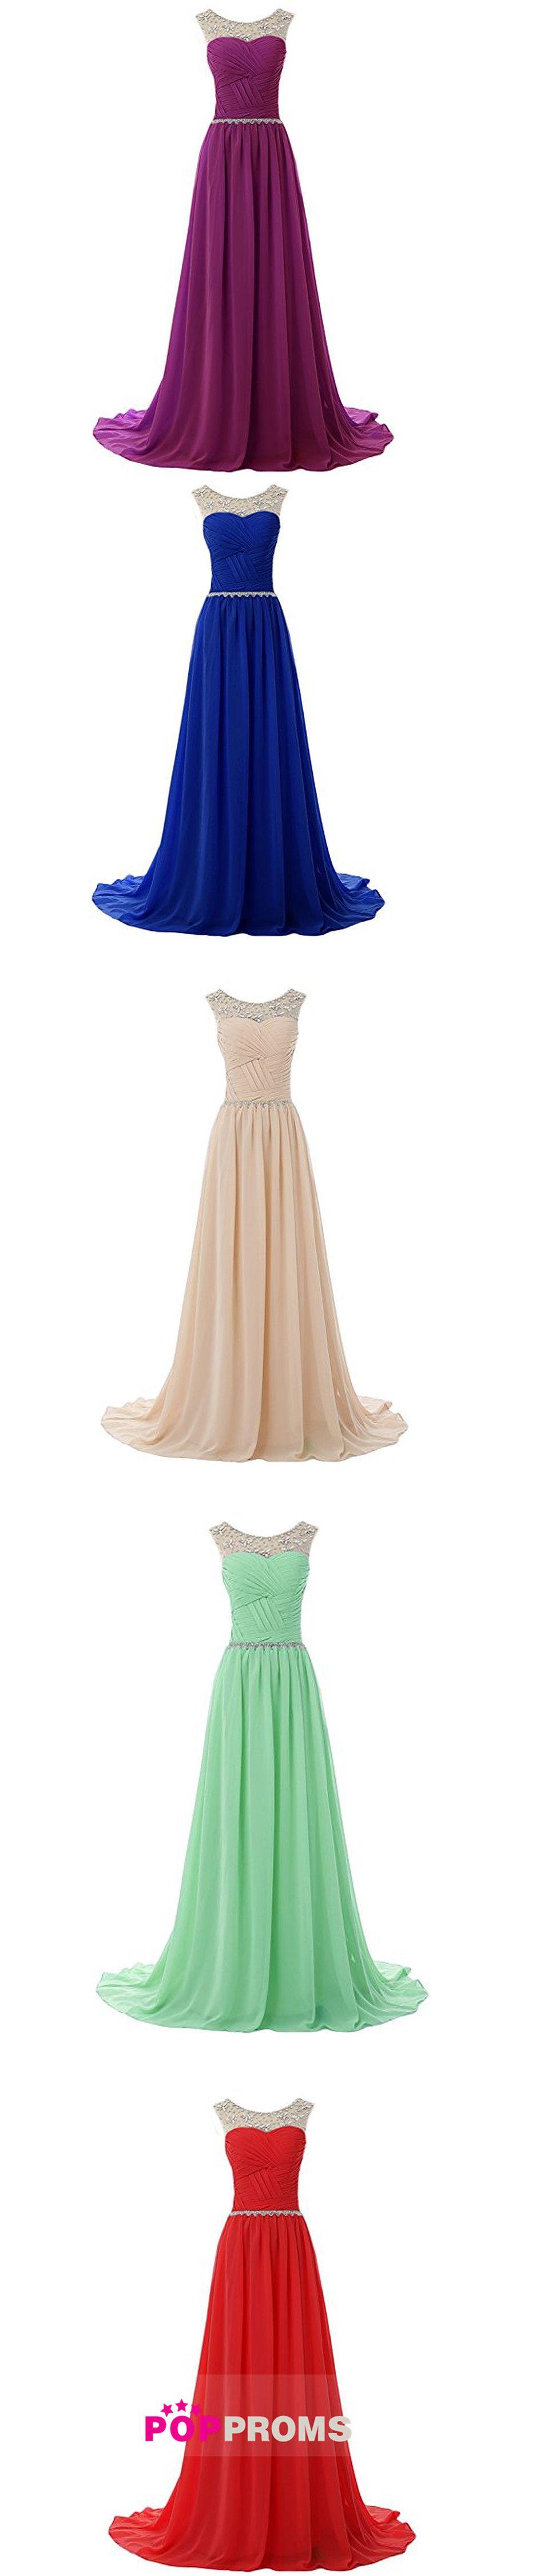 Pin by sisastore on long prom dresses pinterest long prom